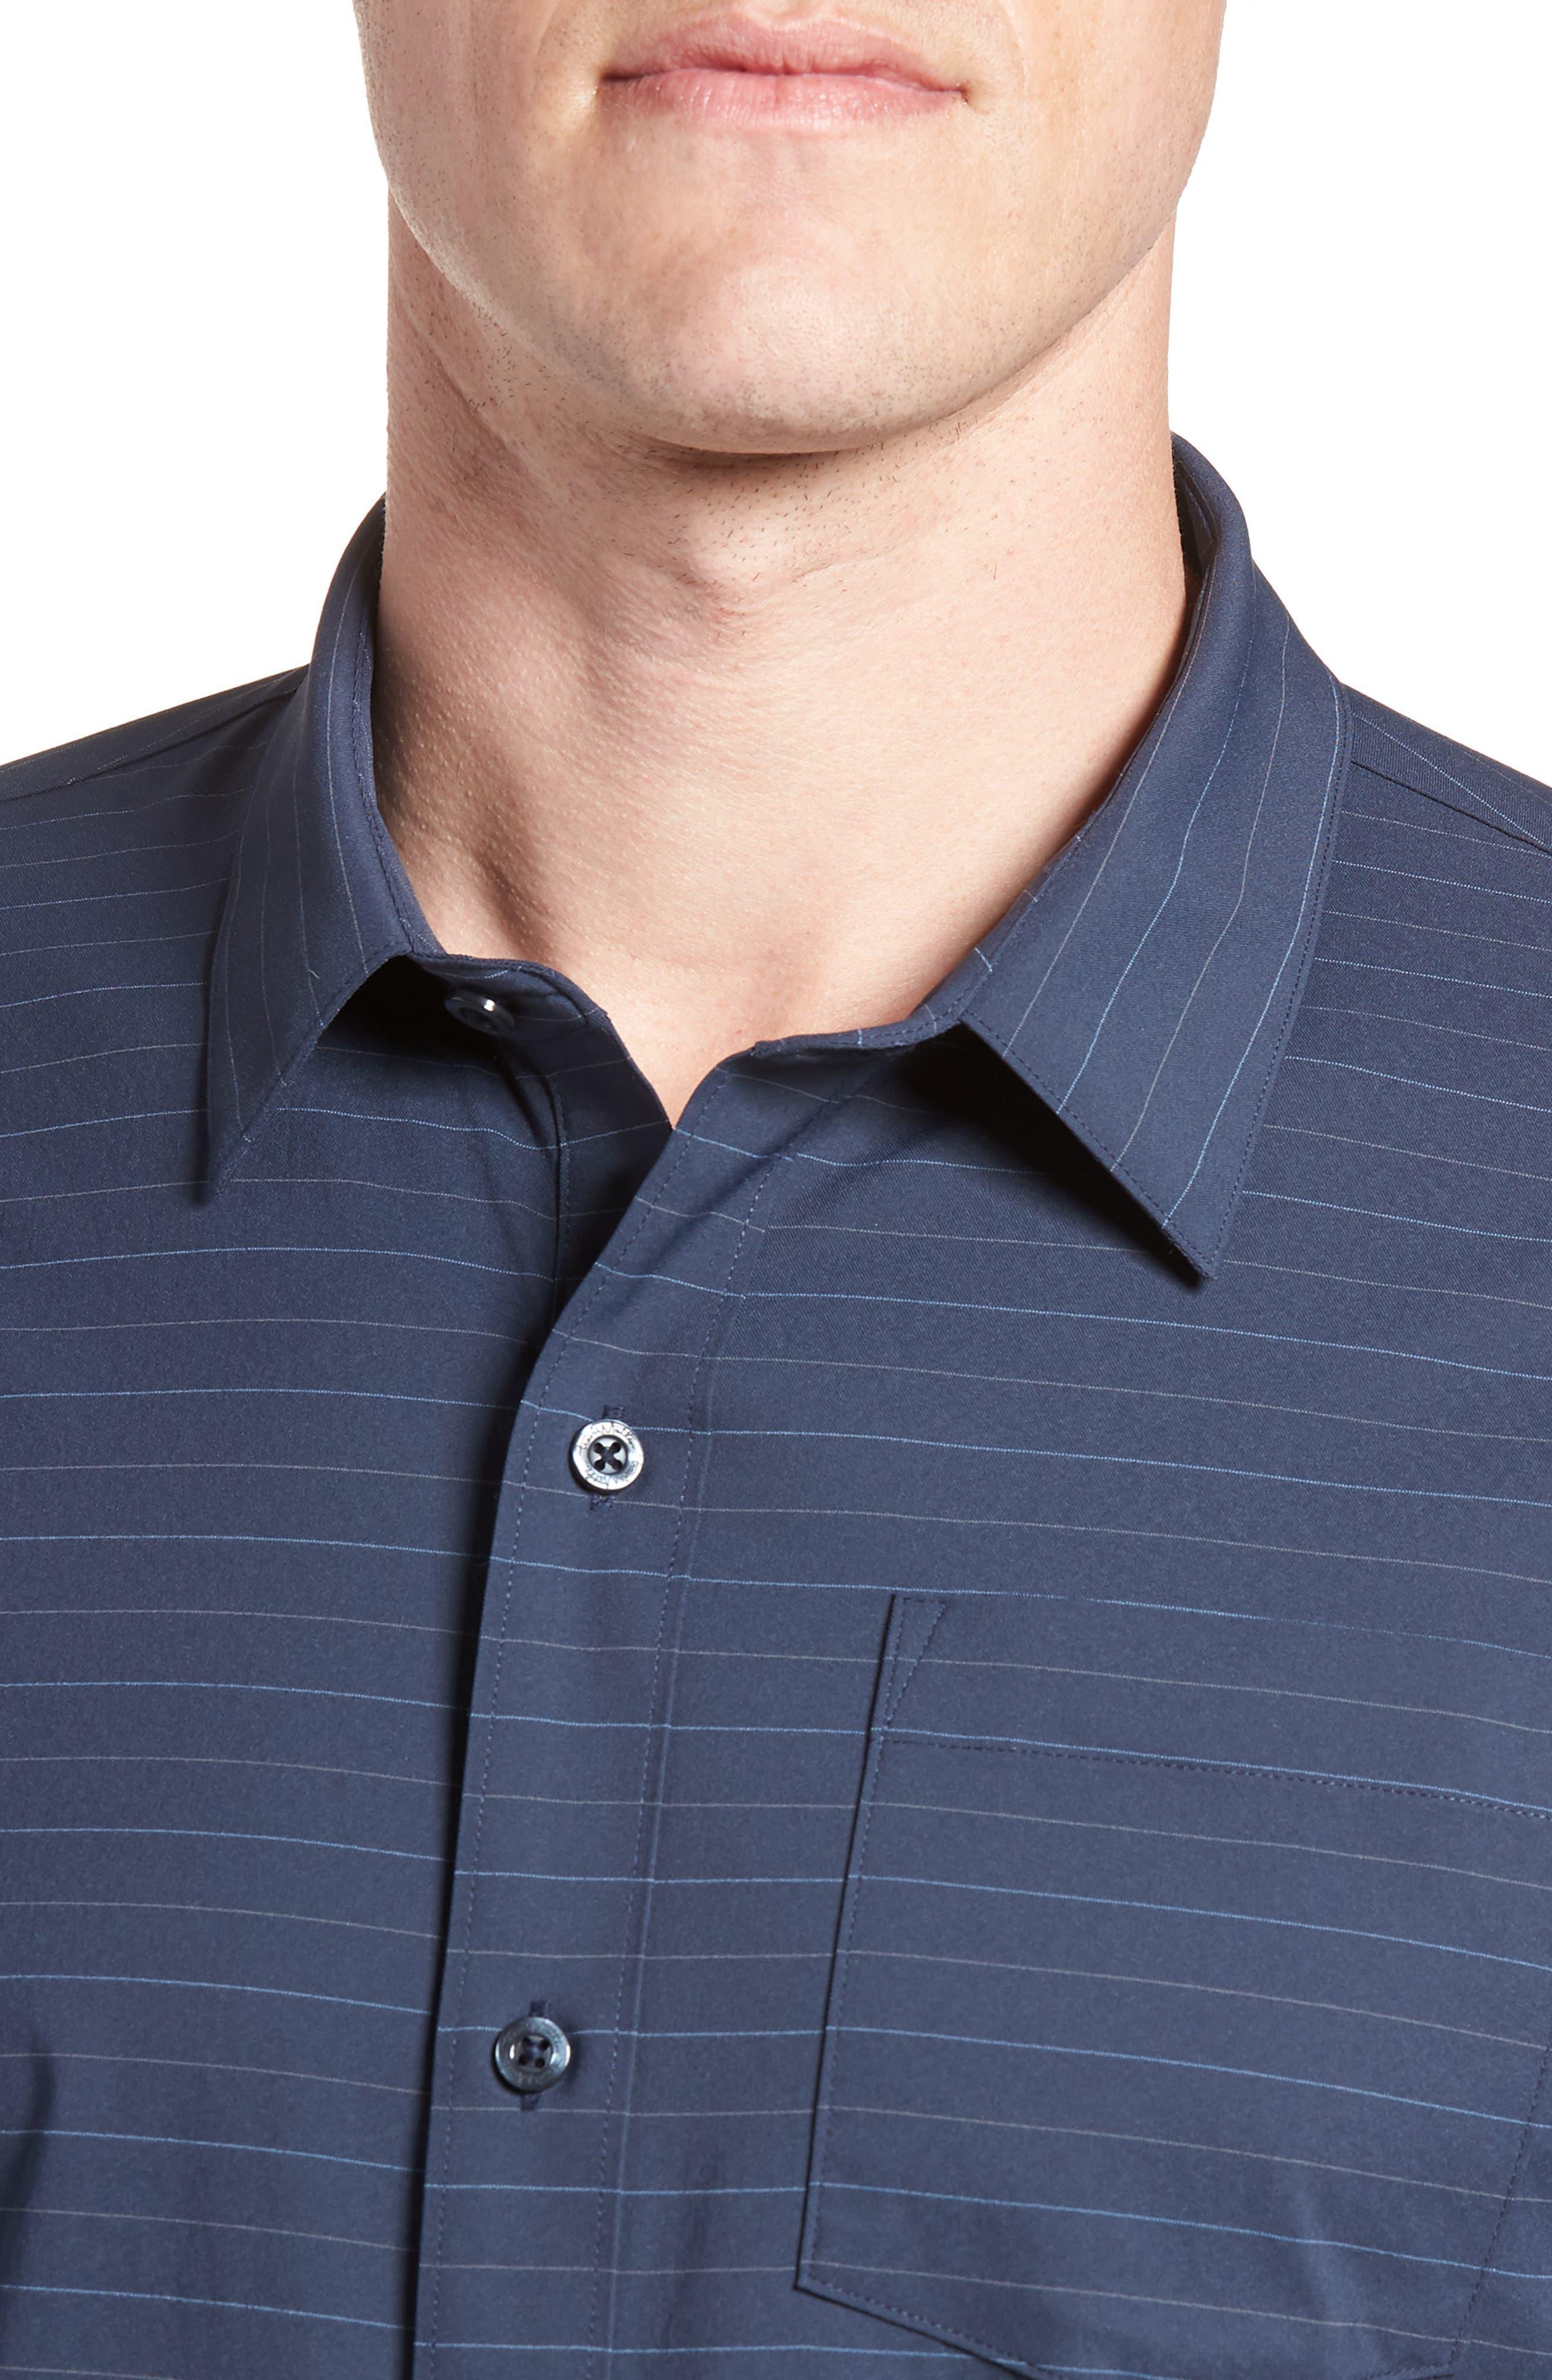 Vagabond Regular Fit Sport Shirt,                             Alternate thumbnail 4, color,                             HEATHER BLUE NIGHTS